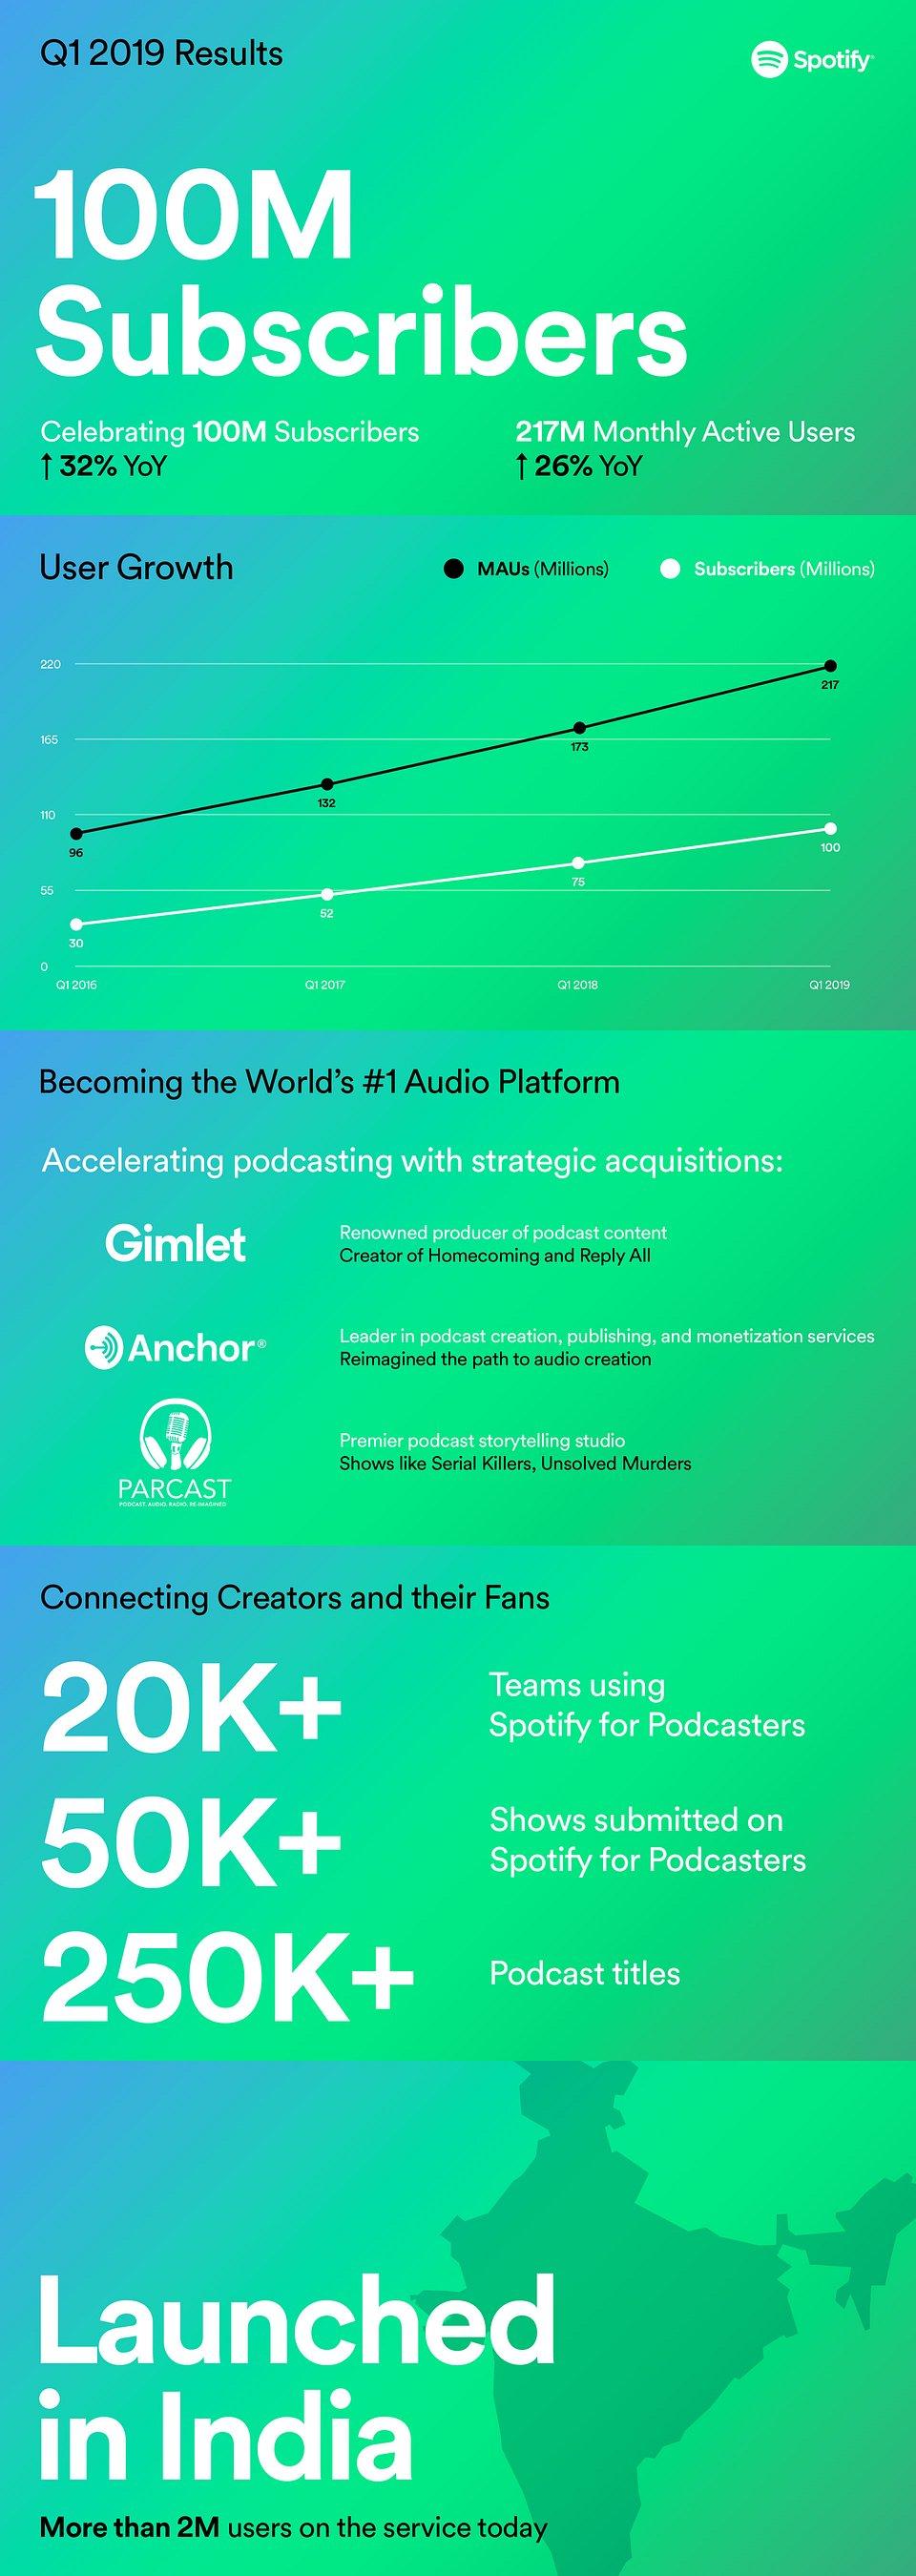 Spotify_Q119_results.jpg